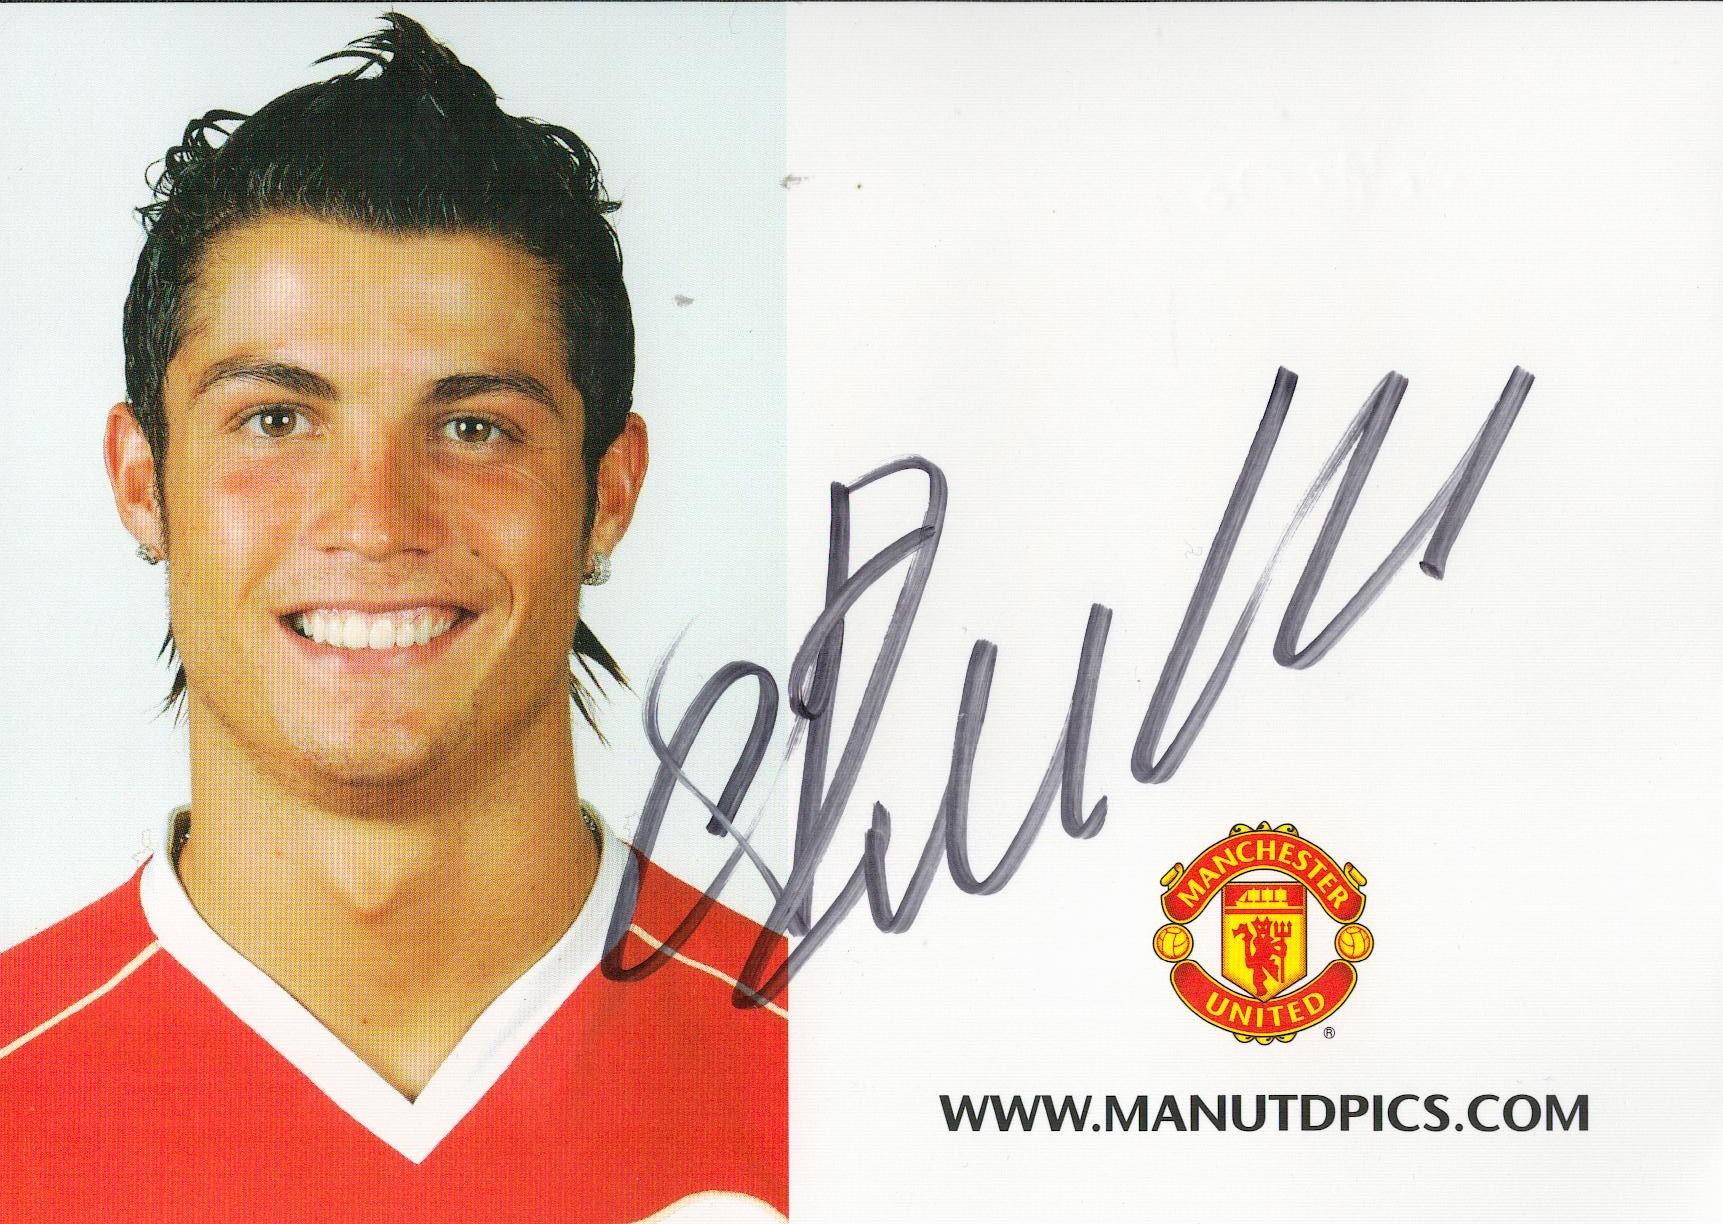 CRISTIANO RONALDO signed Manchester United Club Card Rare 2006/2007 . Good condition. All autographs